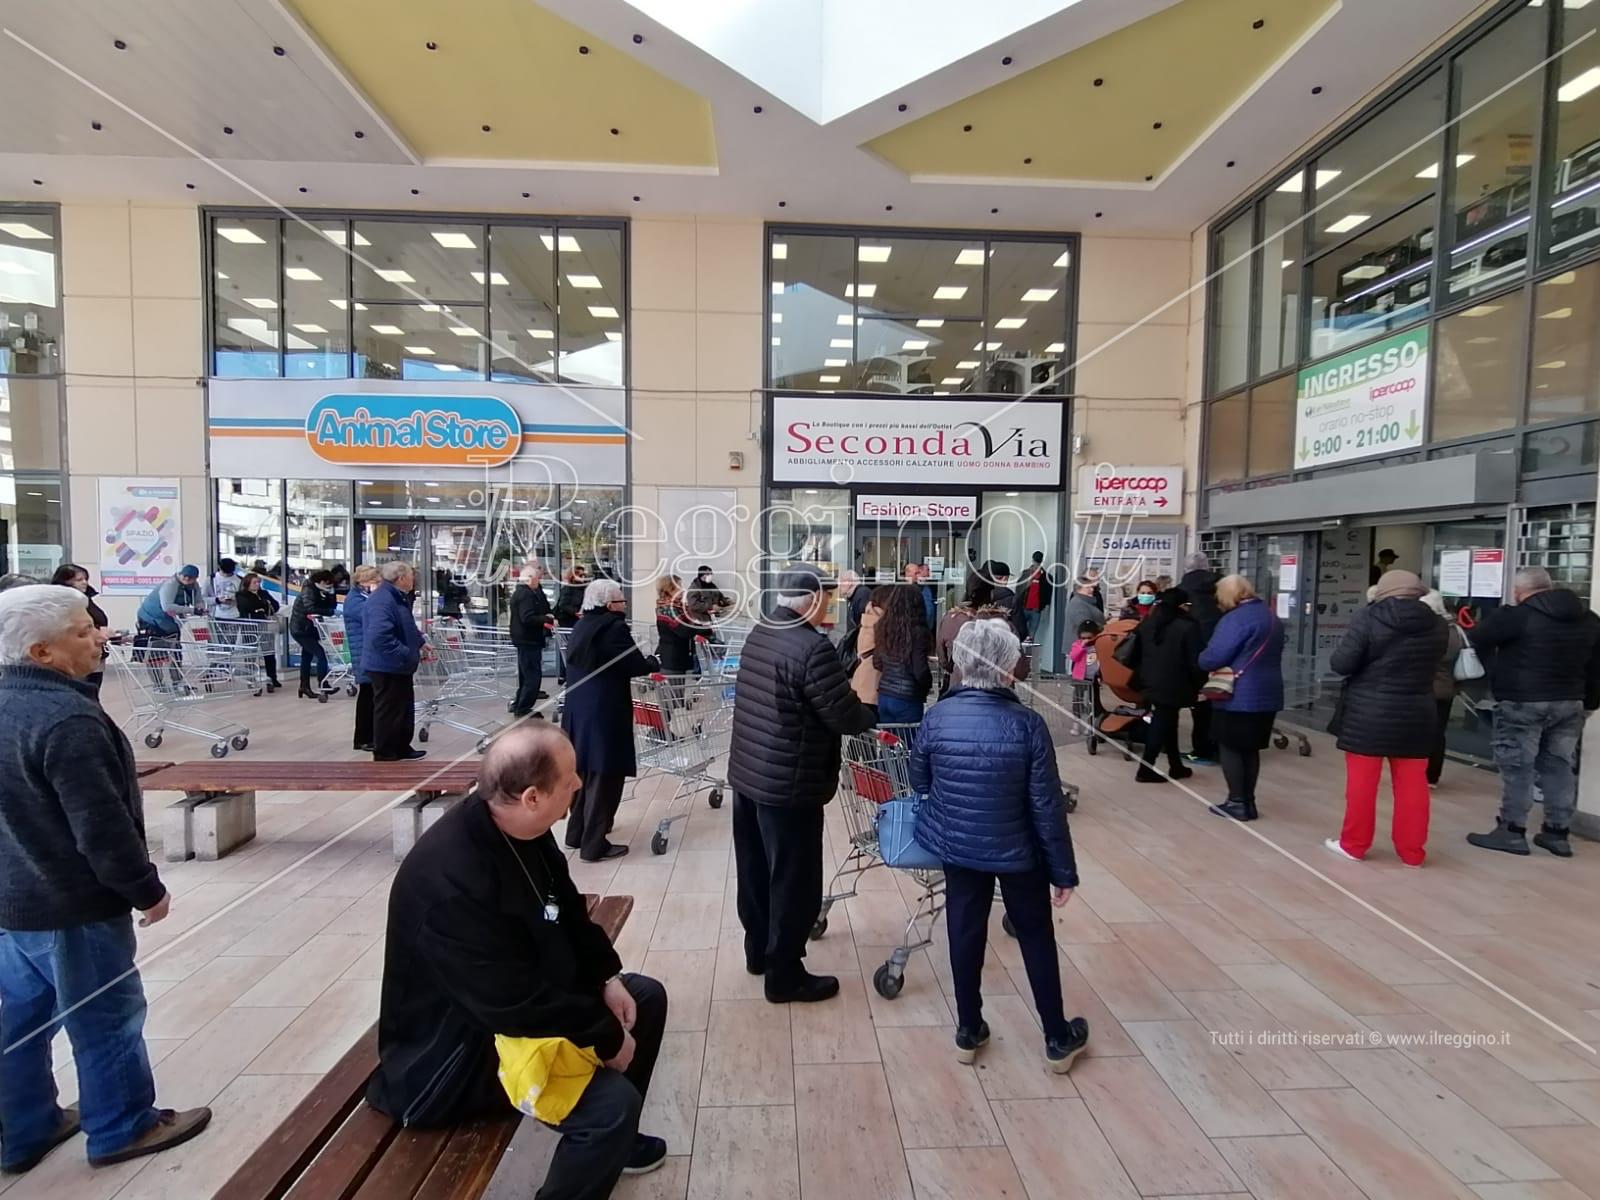 Coronavirus a Reggio Calabria, supermercati presi d'assalto